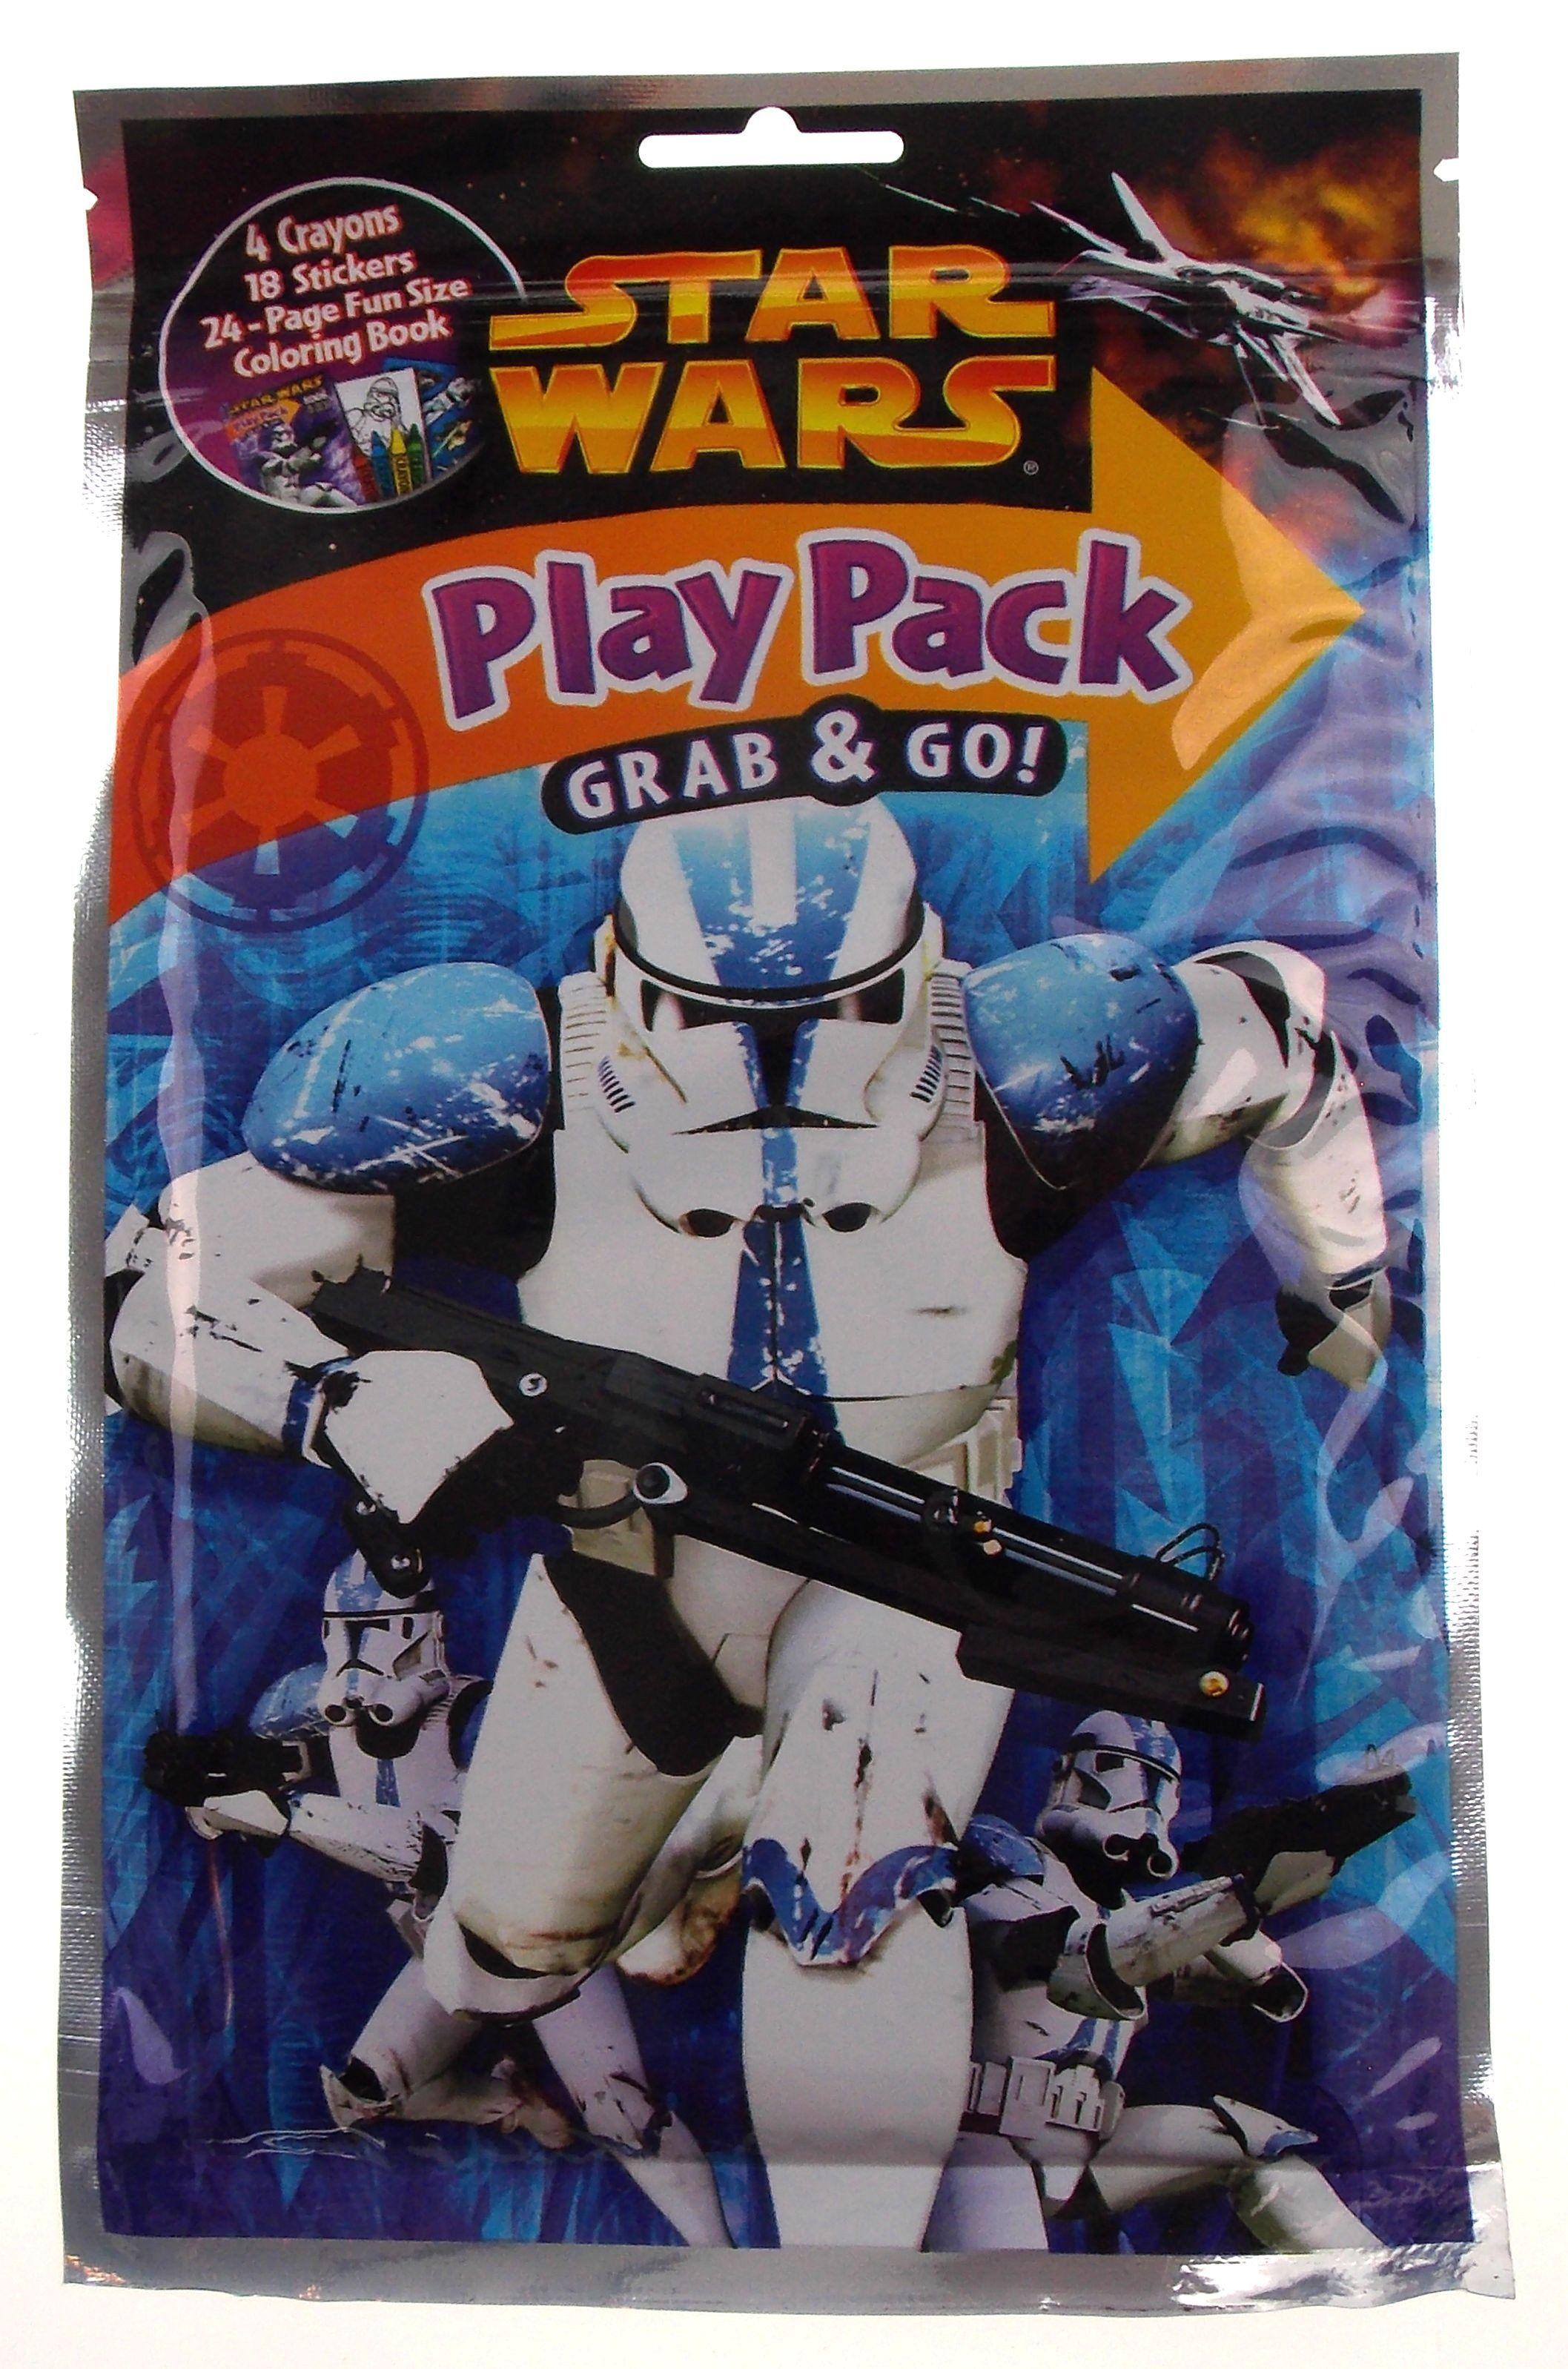 Star Wars Play Pack Stormtroopers Grab & Go Set 8 Coloring Book ...